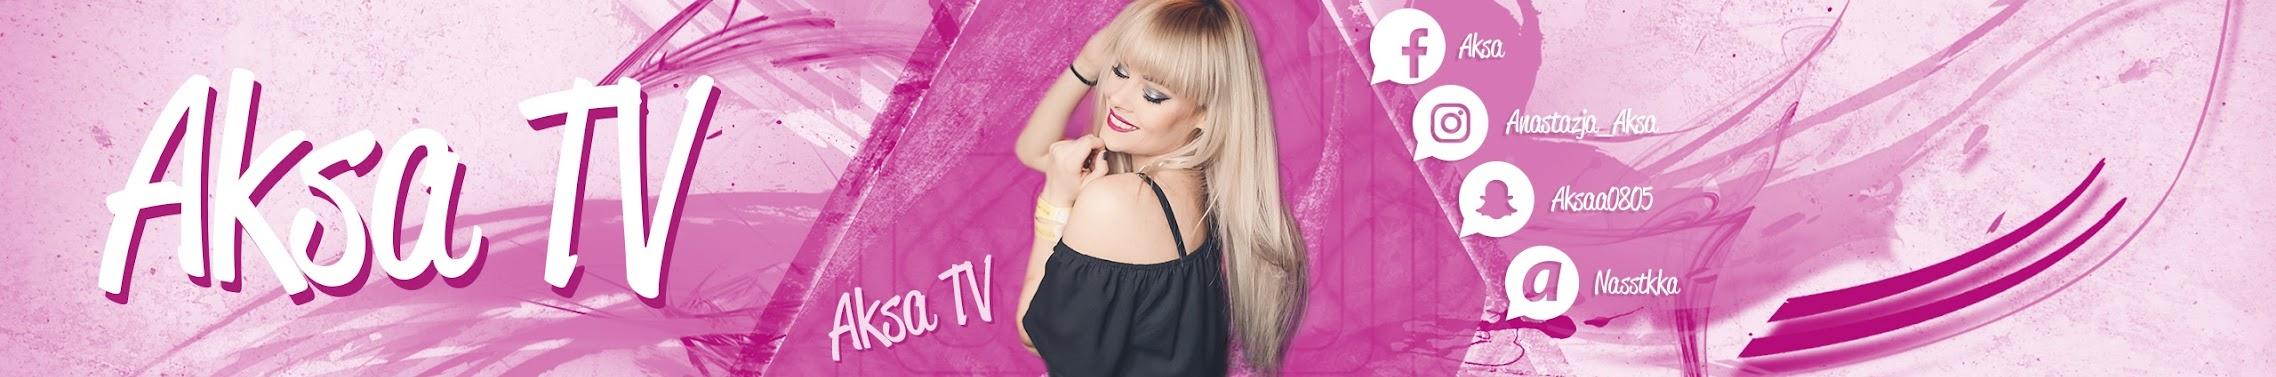 Aksa TV